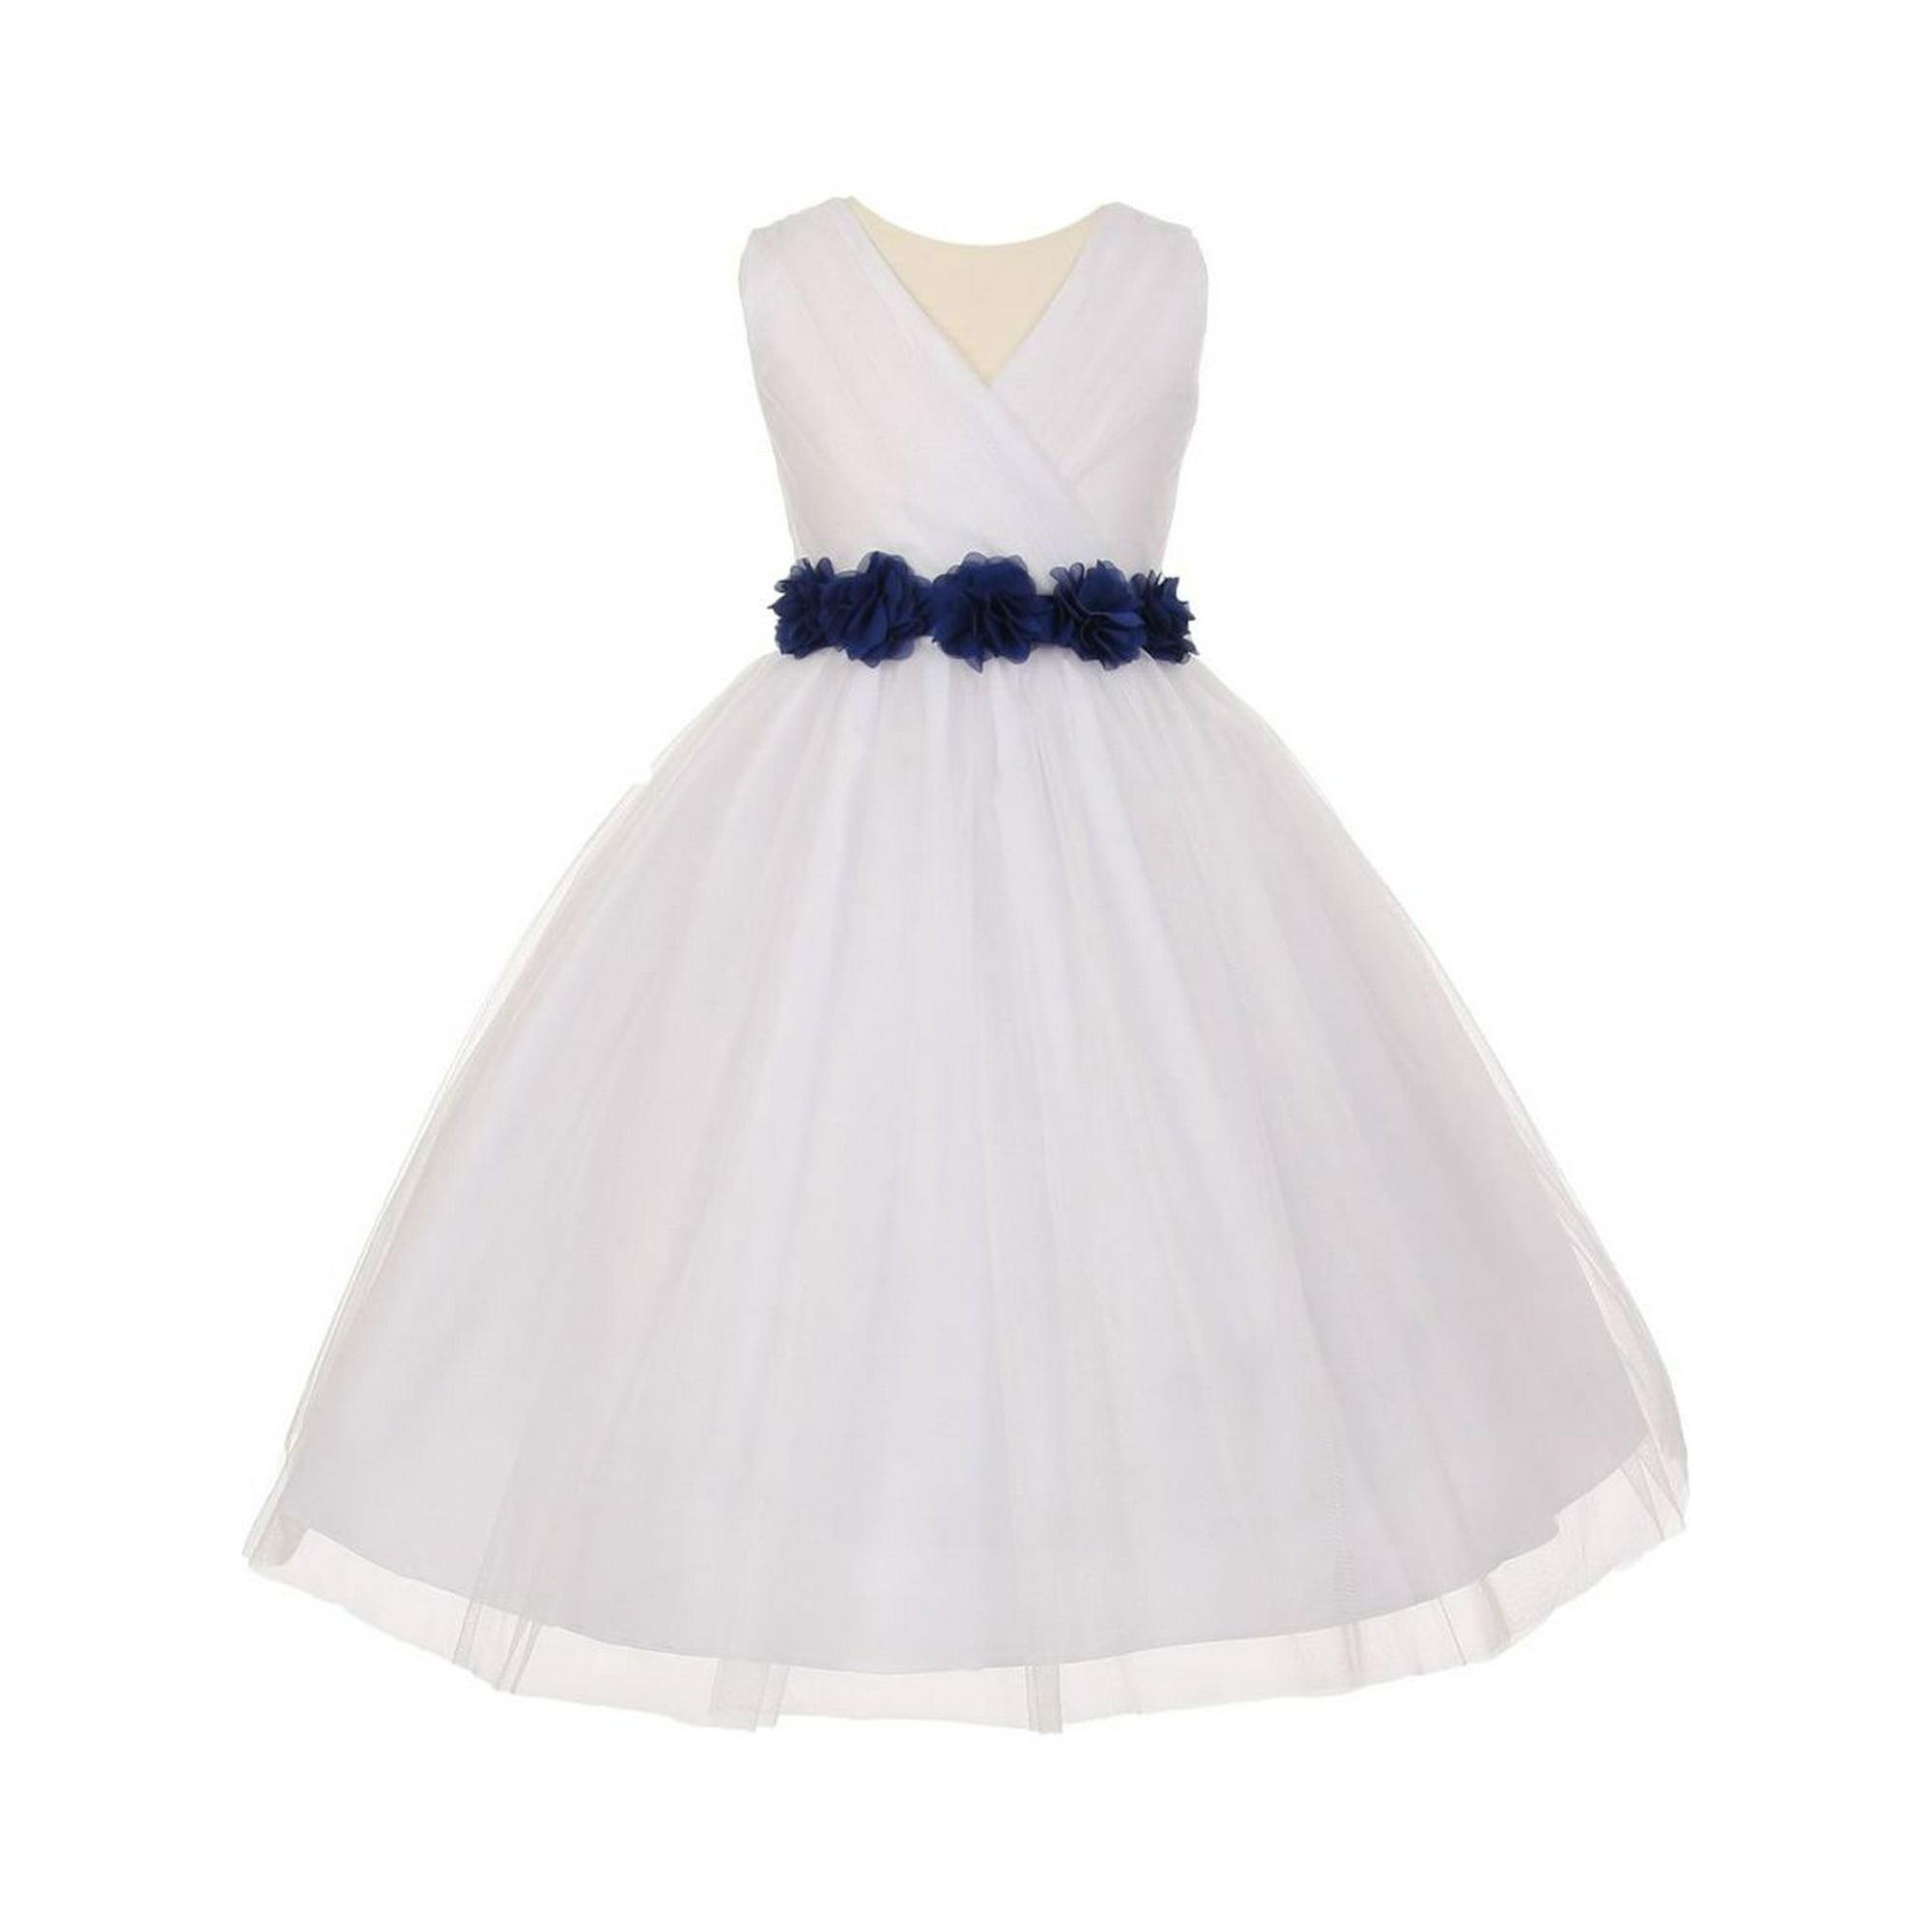 Girls White Royal Blue Chiffon Flowers Tulle Junior Bridesmaid Dress 10 Walmart Canada,Camo Wedding Dress Orange